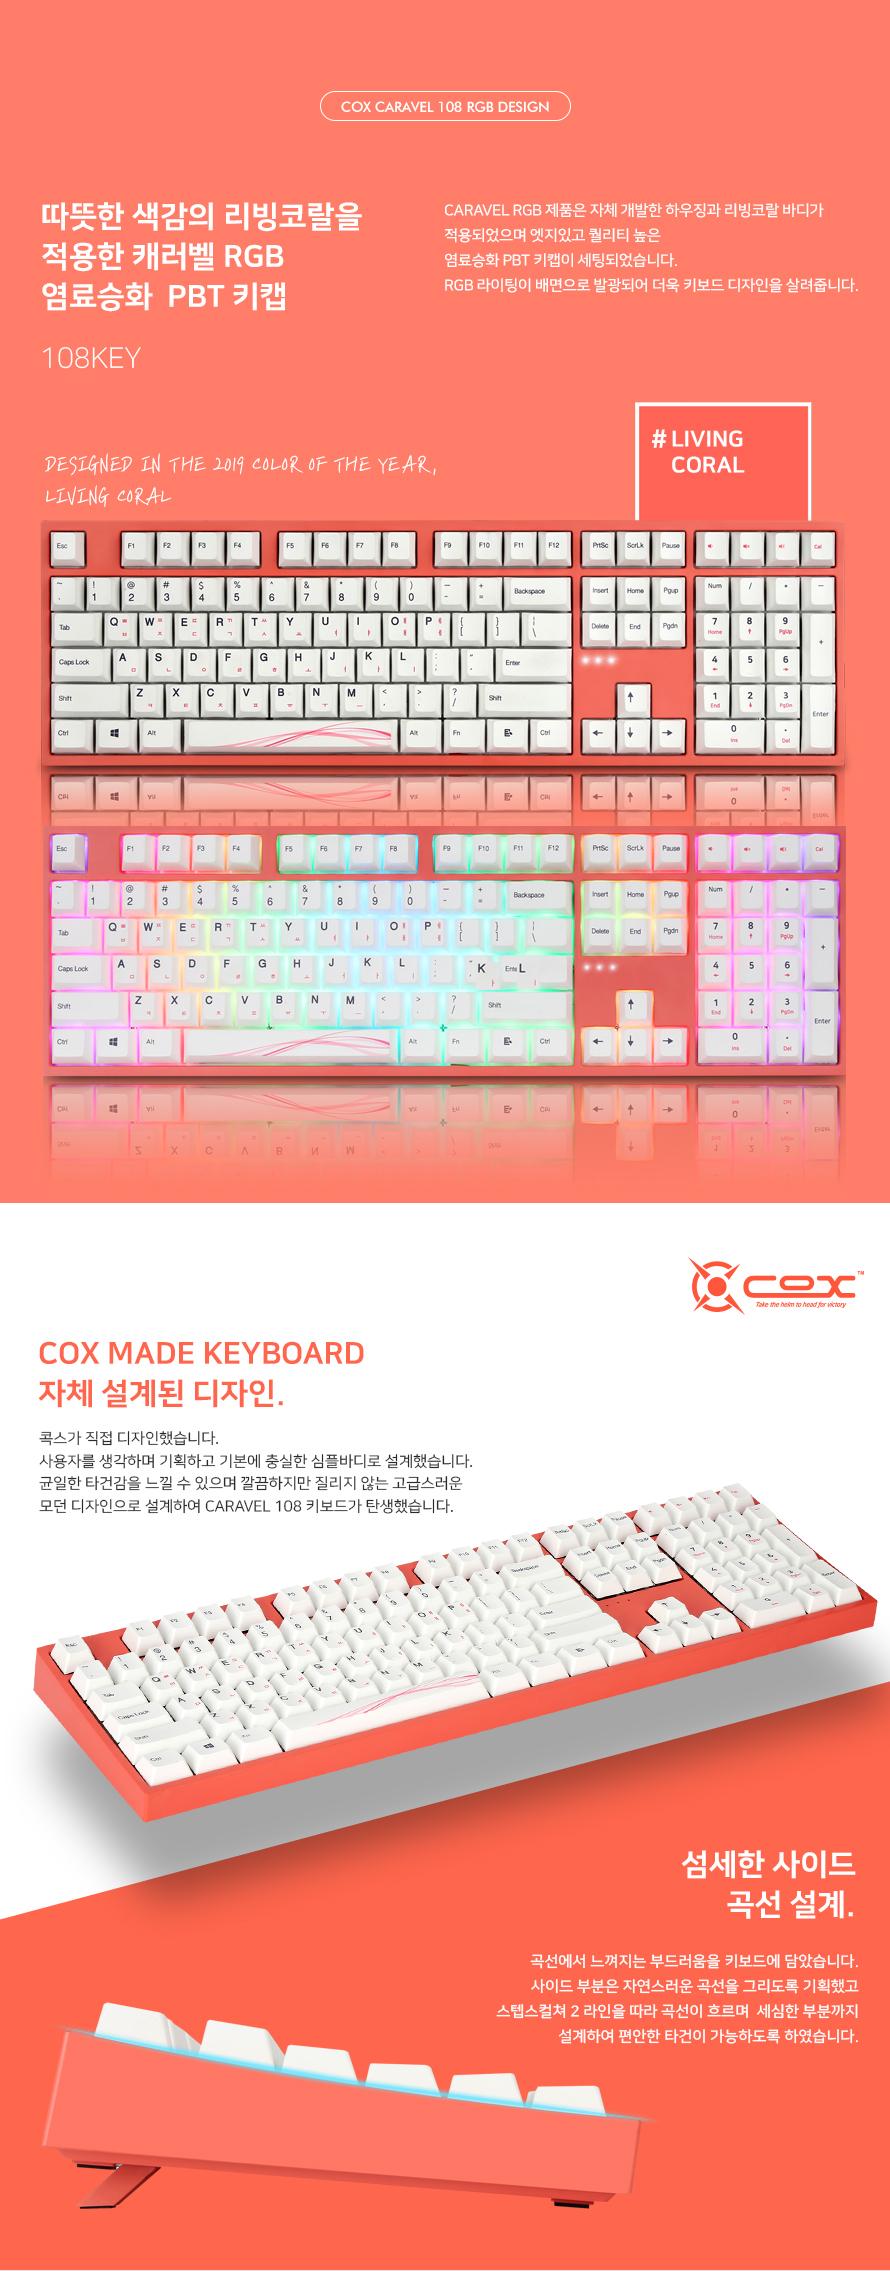 COX  CARAVEL108 게이트론 교체축 RGB 염료승화 PBT 리빙코랄(갈축)